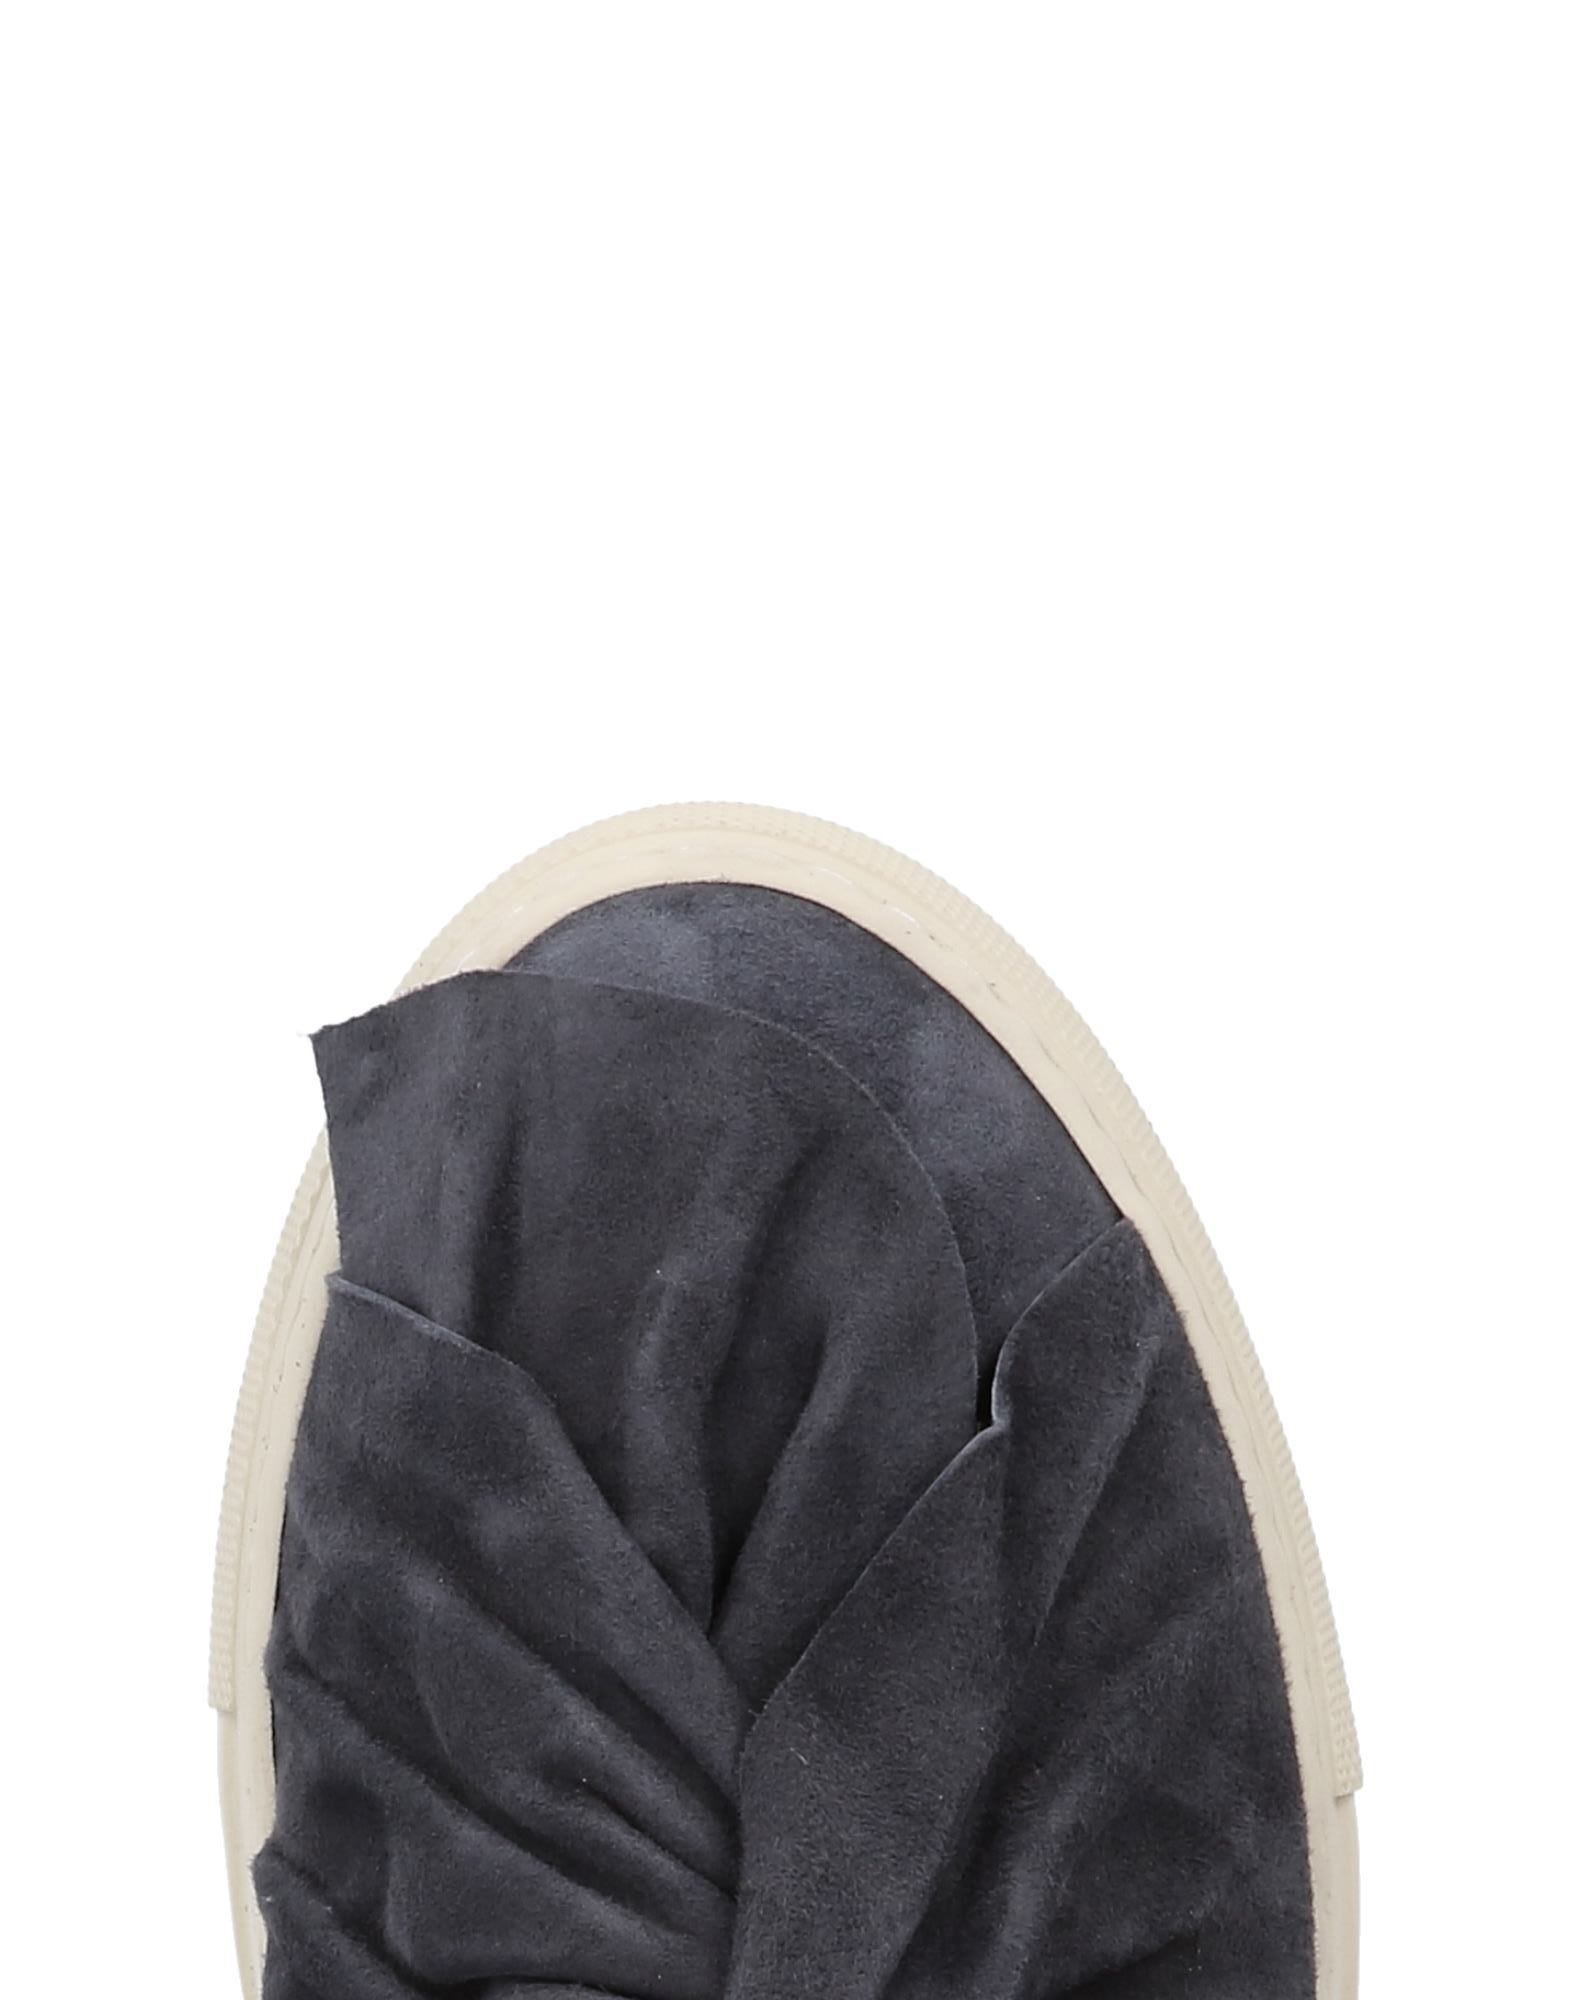 Rabatt Schuhe  Ports 1961 Sneakers Damen  Schuhe 11463091OD ad419b